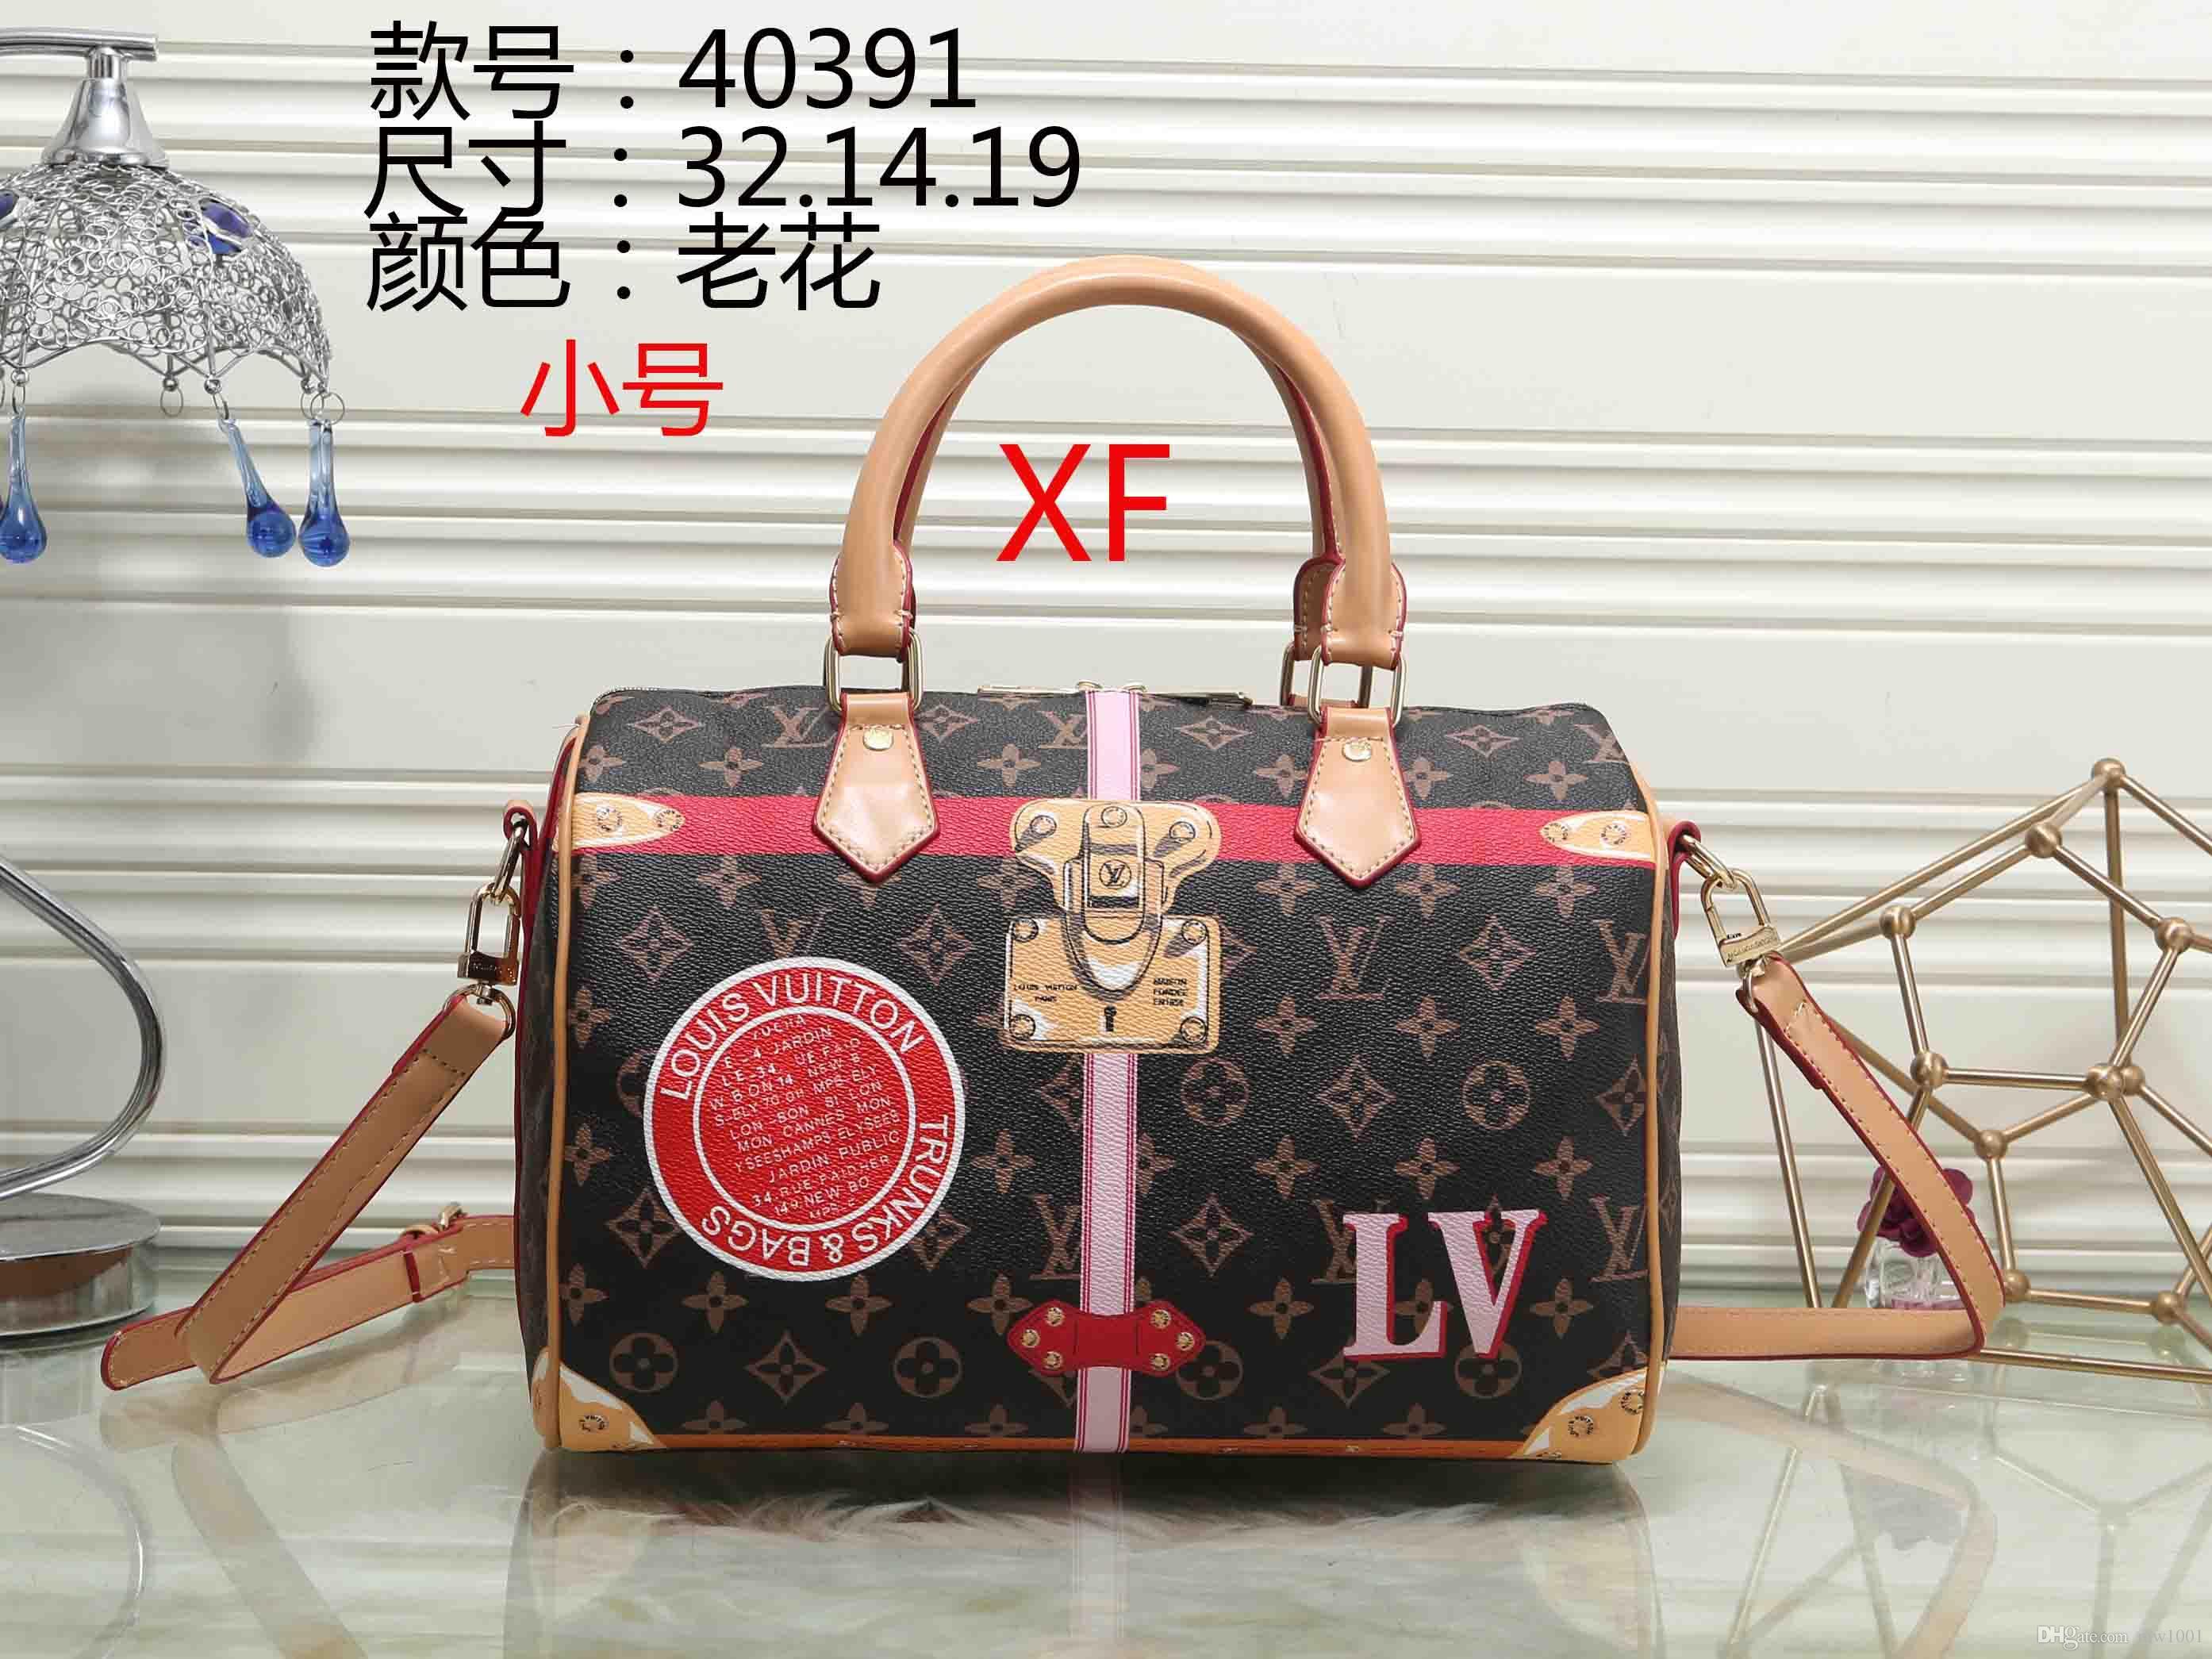 2018 Brand New Designer Handbags Luxury Brand Handbag Fashion Totes ... 956662d7440c9